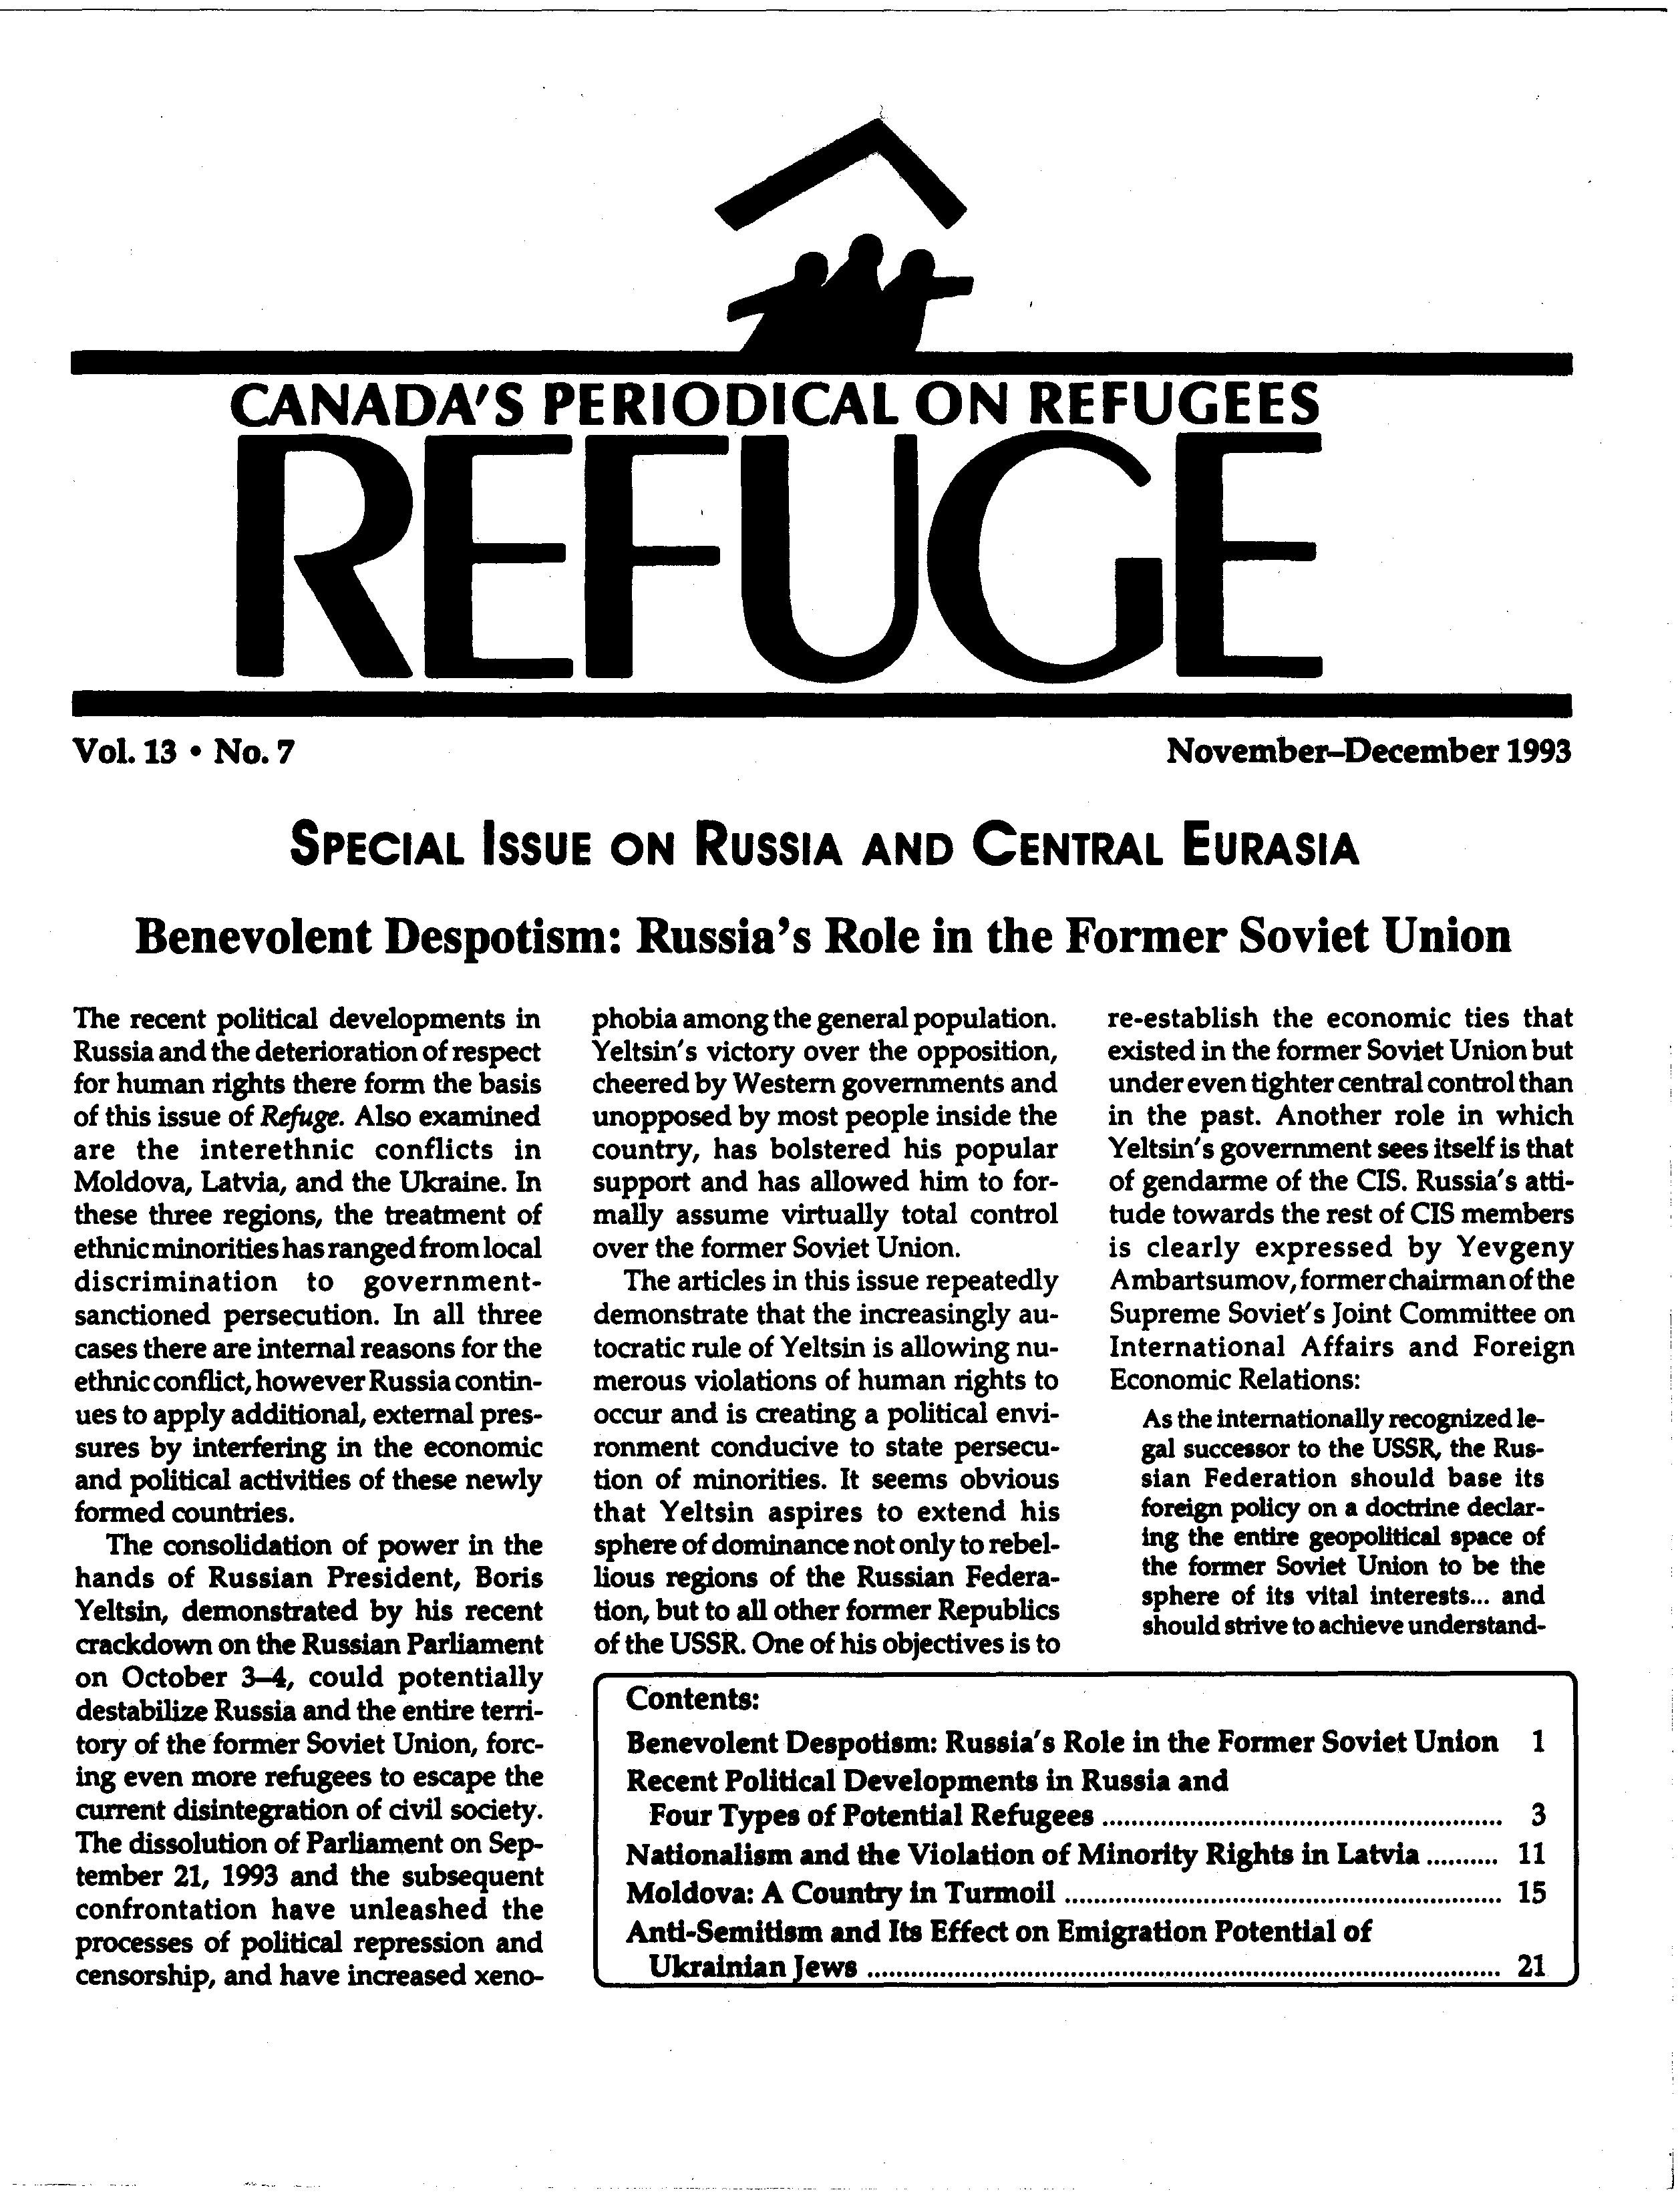 first page Refuge vol. 13.7 1993